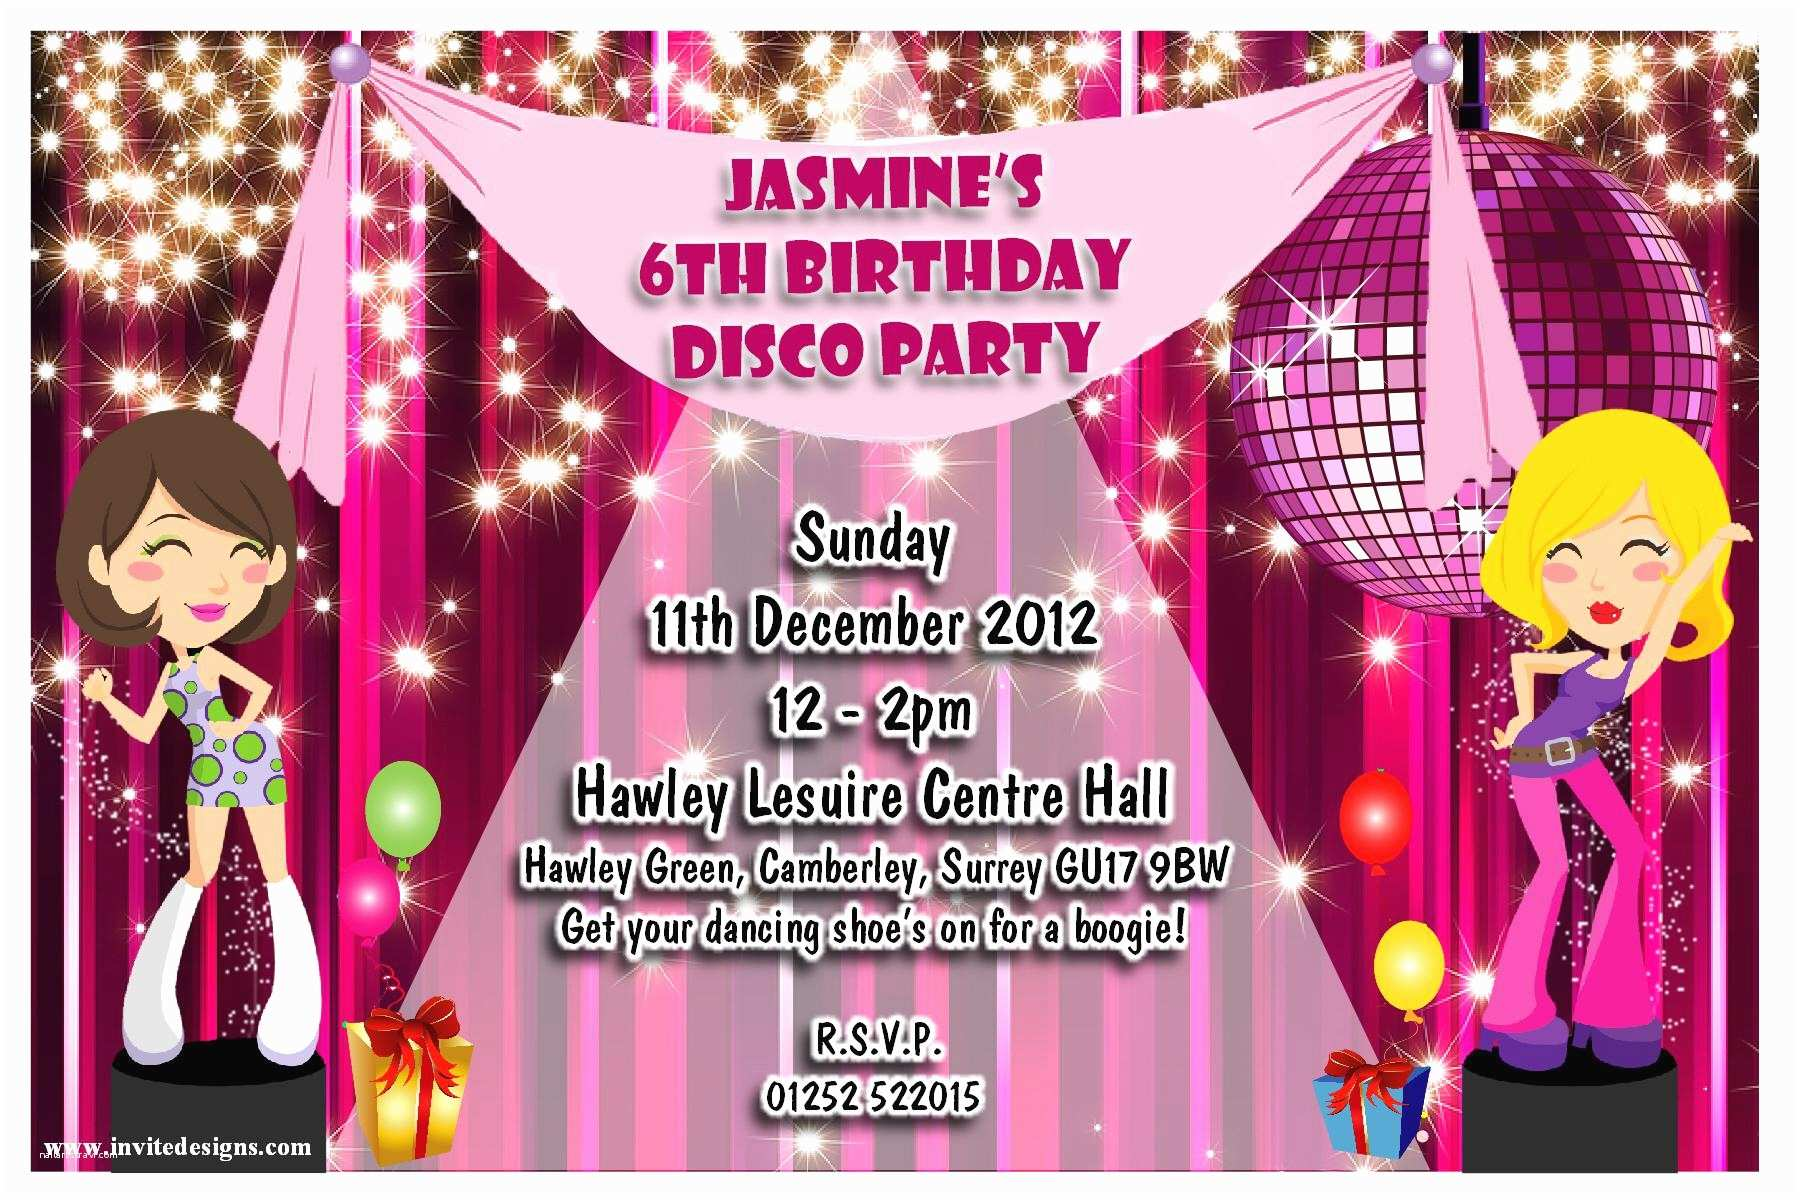 Disco Party Invitations Dance Party Invitations